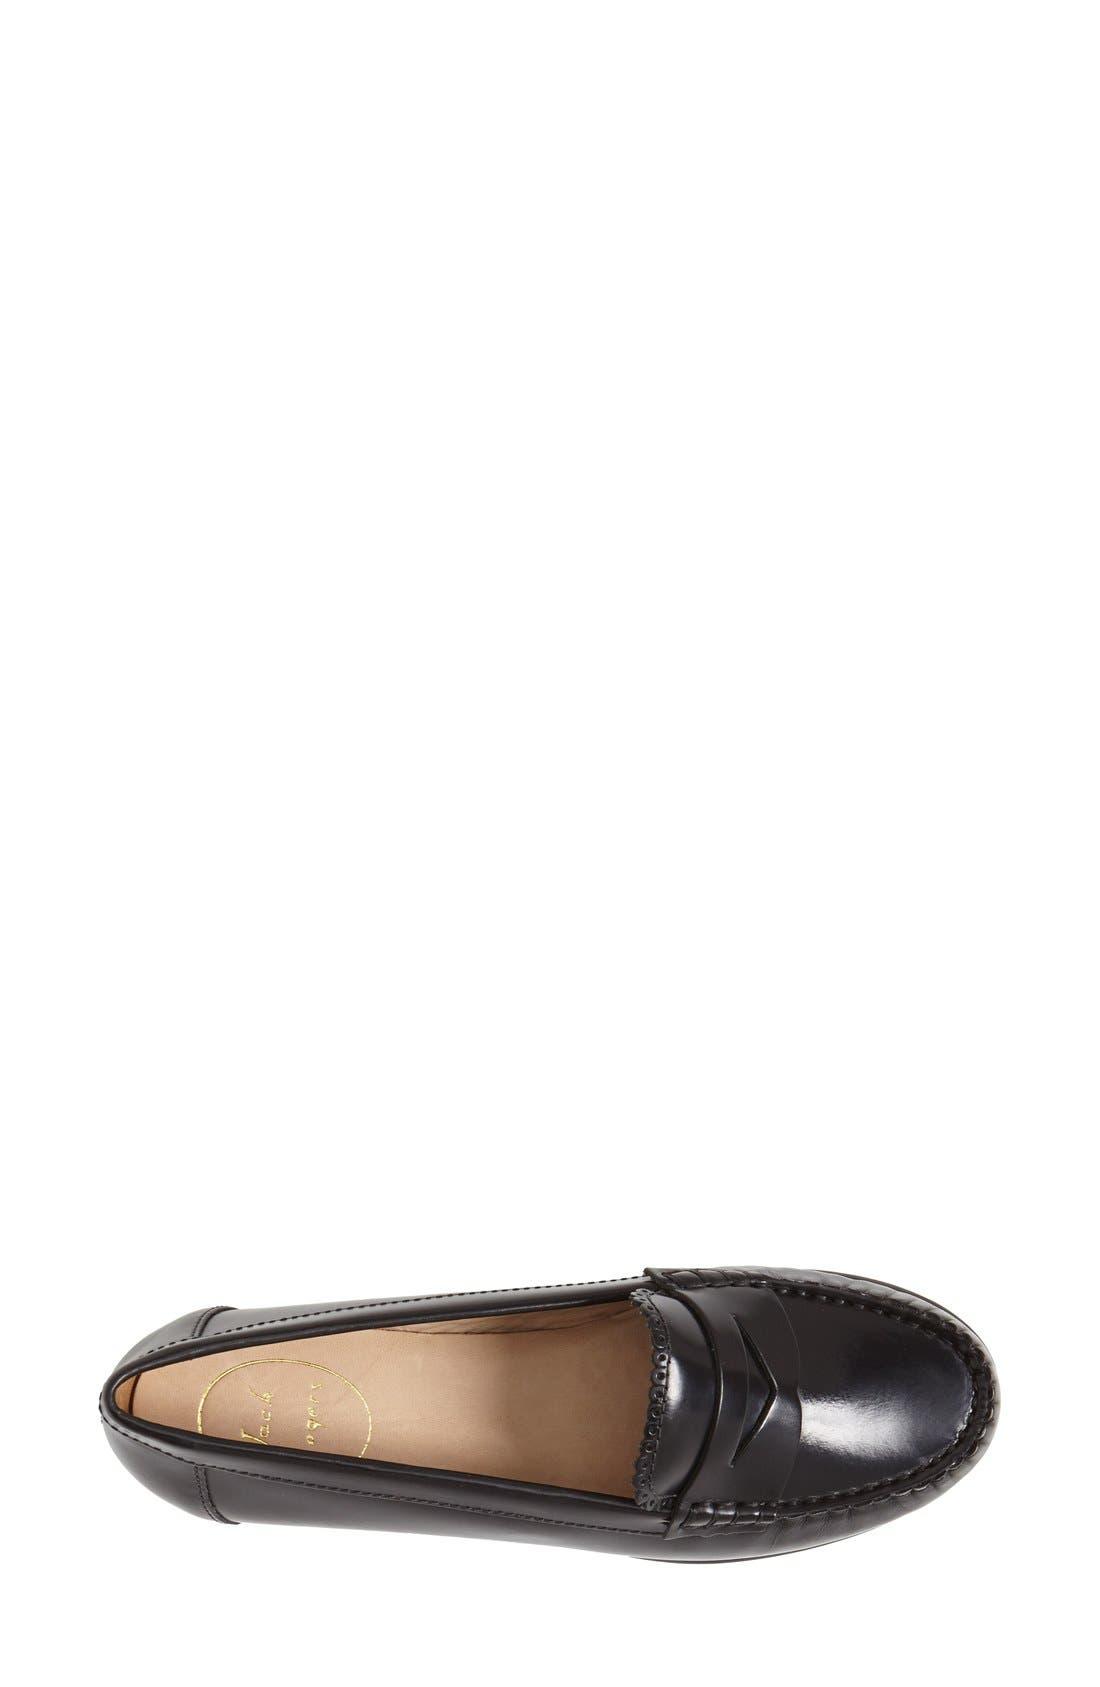 'Quinn' Leather Loafer,                             Alternate thumbnail 13, color,